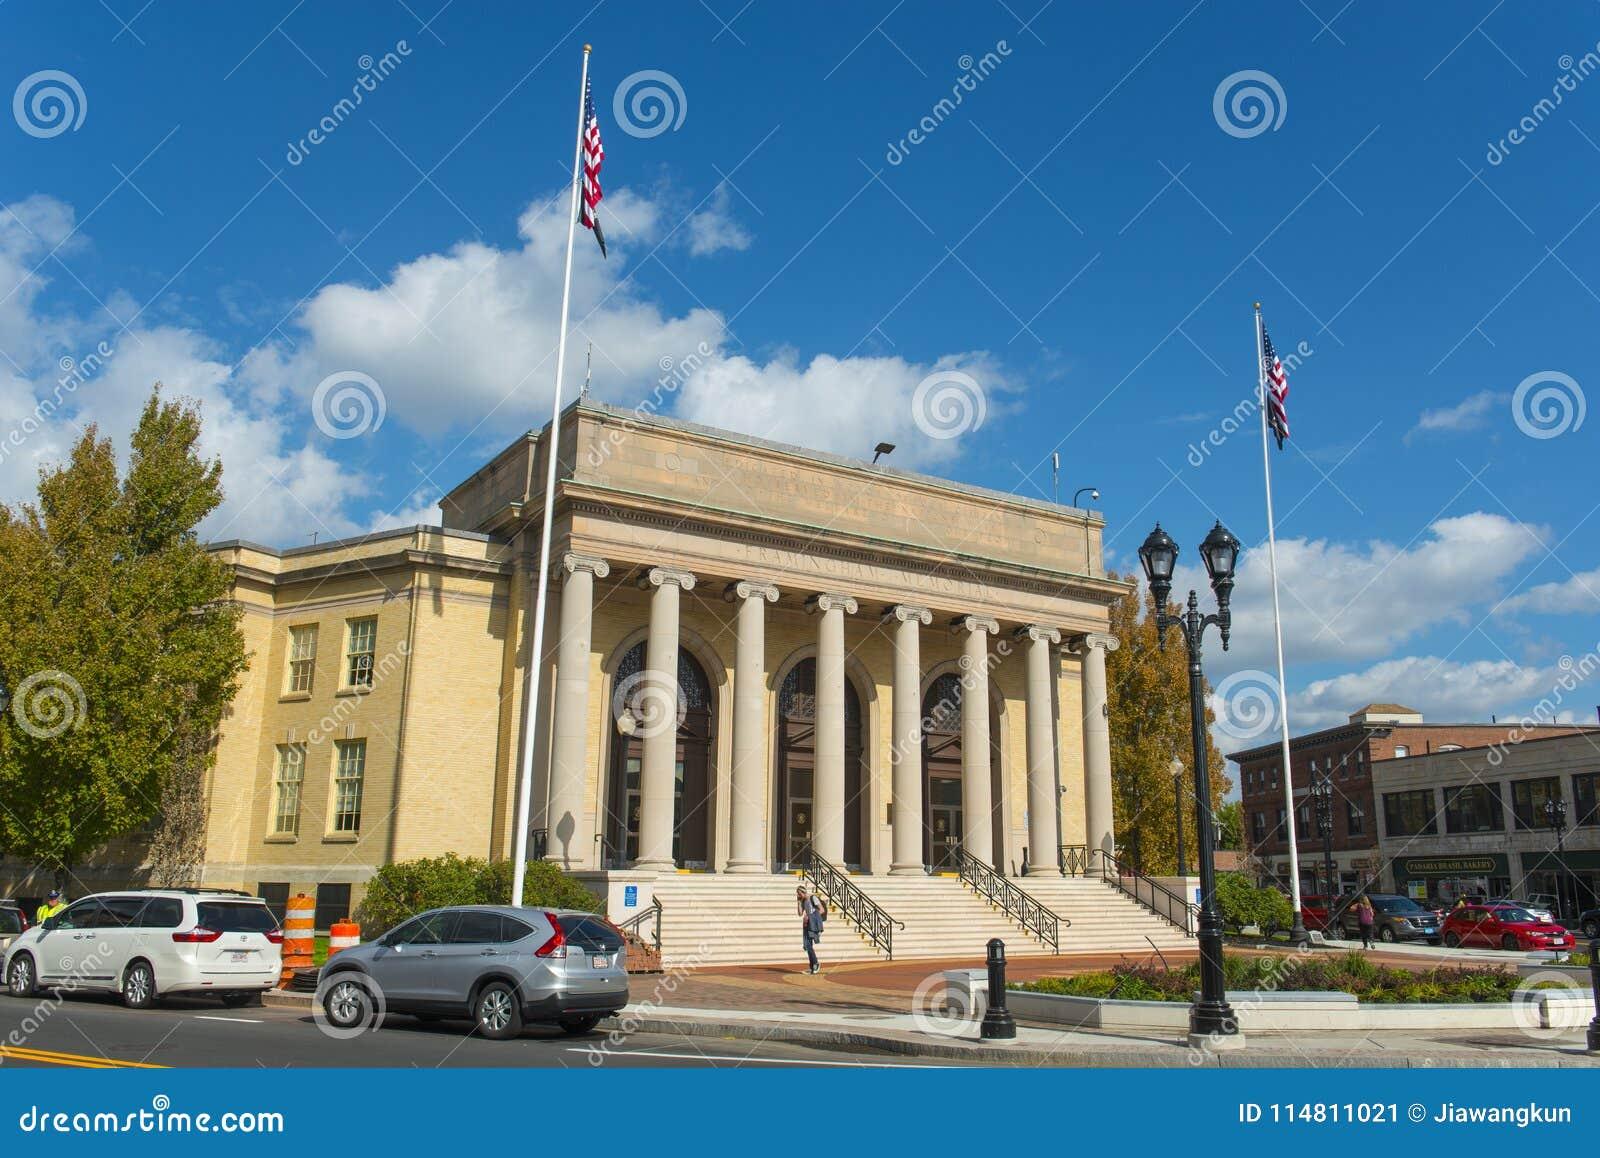 Ayuntamiento, Massachusetts, los E.E.U.U. Framingham